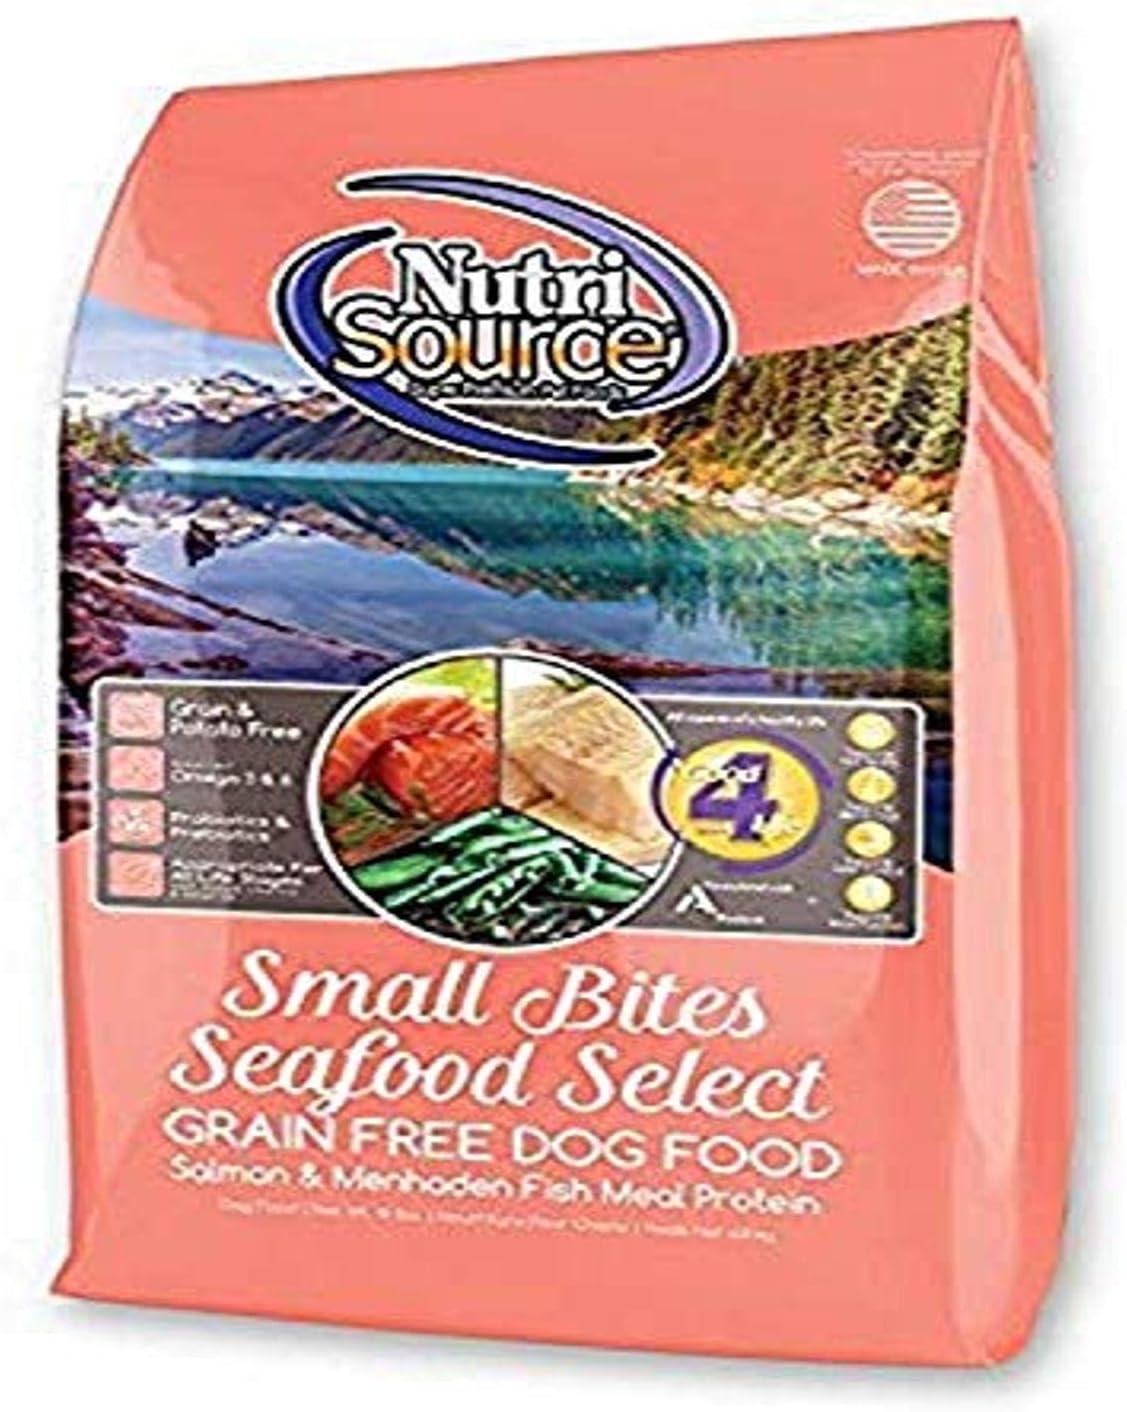 Nutri Source Small Breed Seafood Select Gf Dog Food 15 Lb